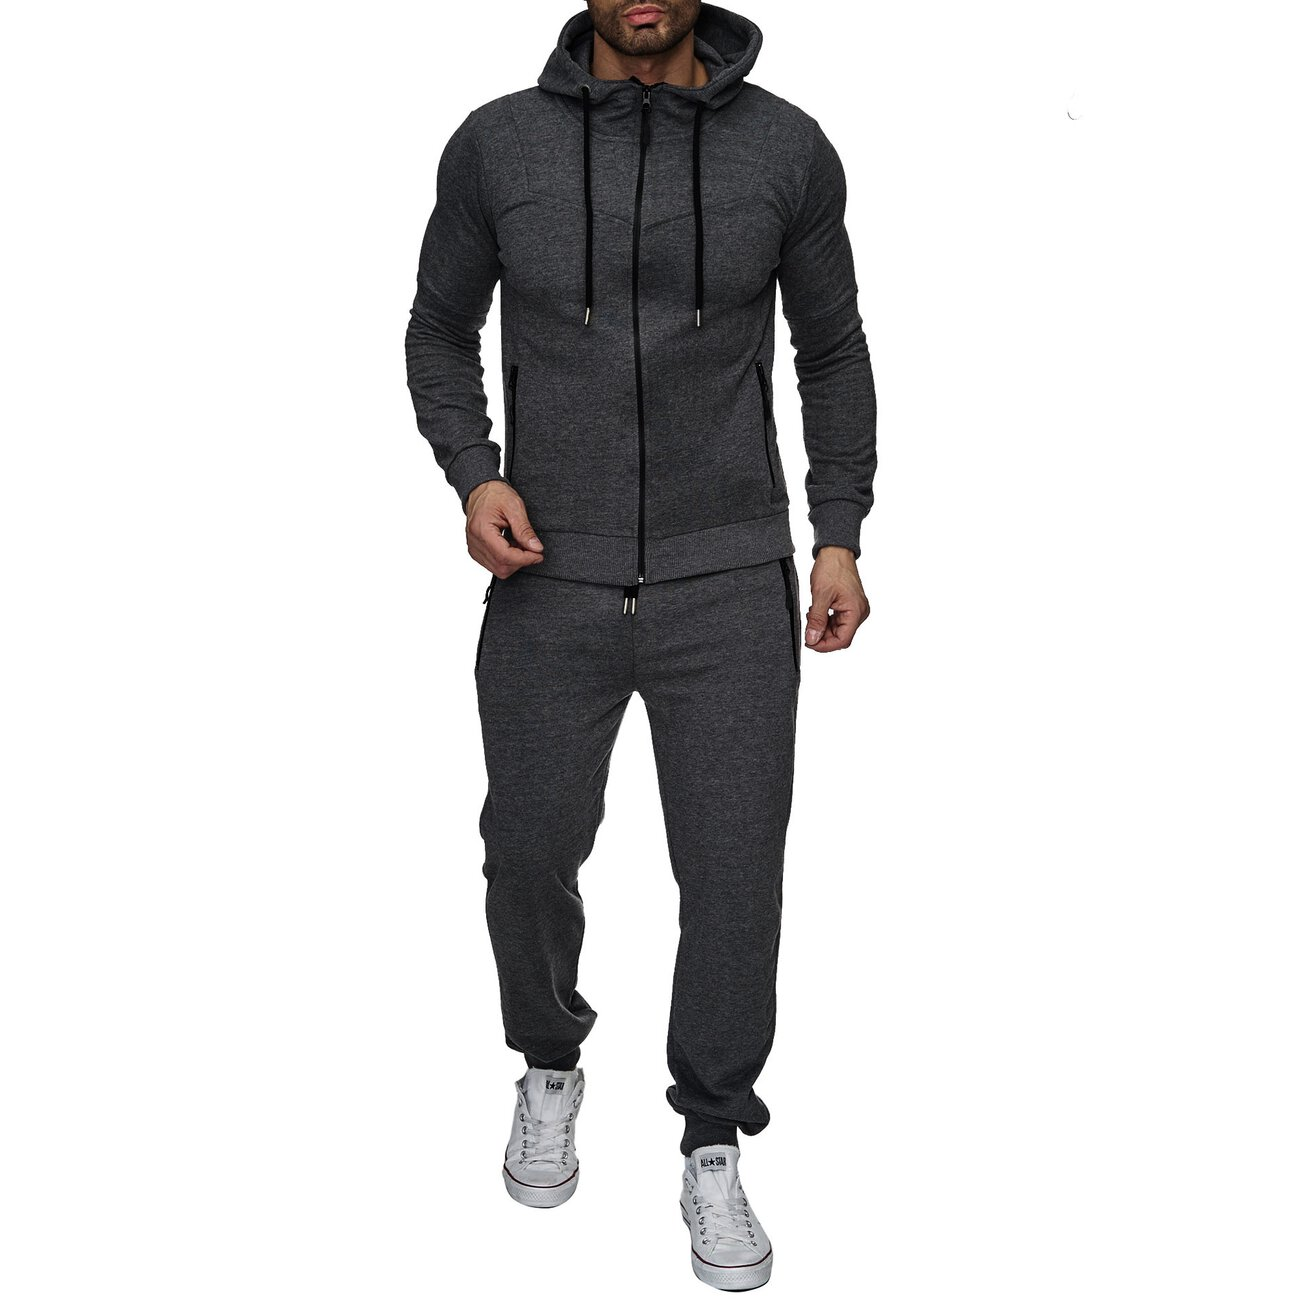 Reslad Jogging Anzug Herren Trainingsanzug Sport Anzug Jogging Hose + Oberteil RS 5063